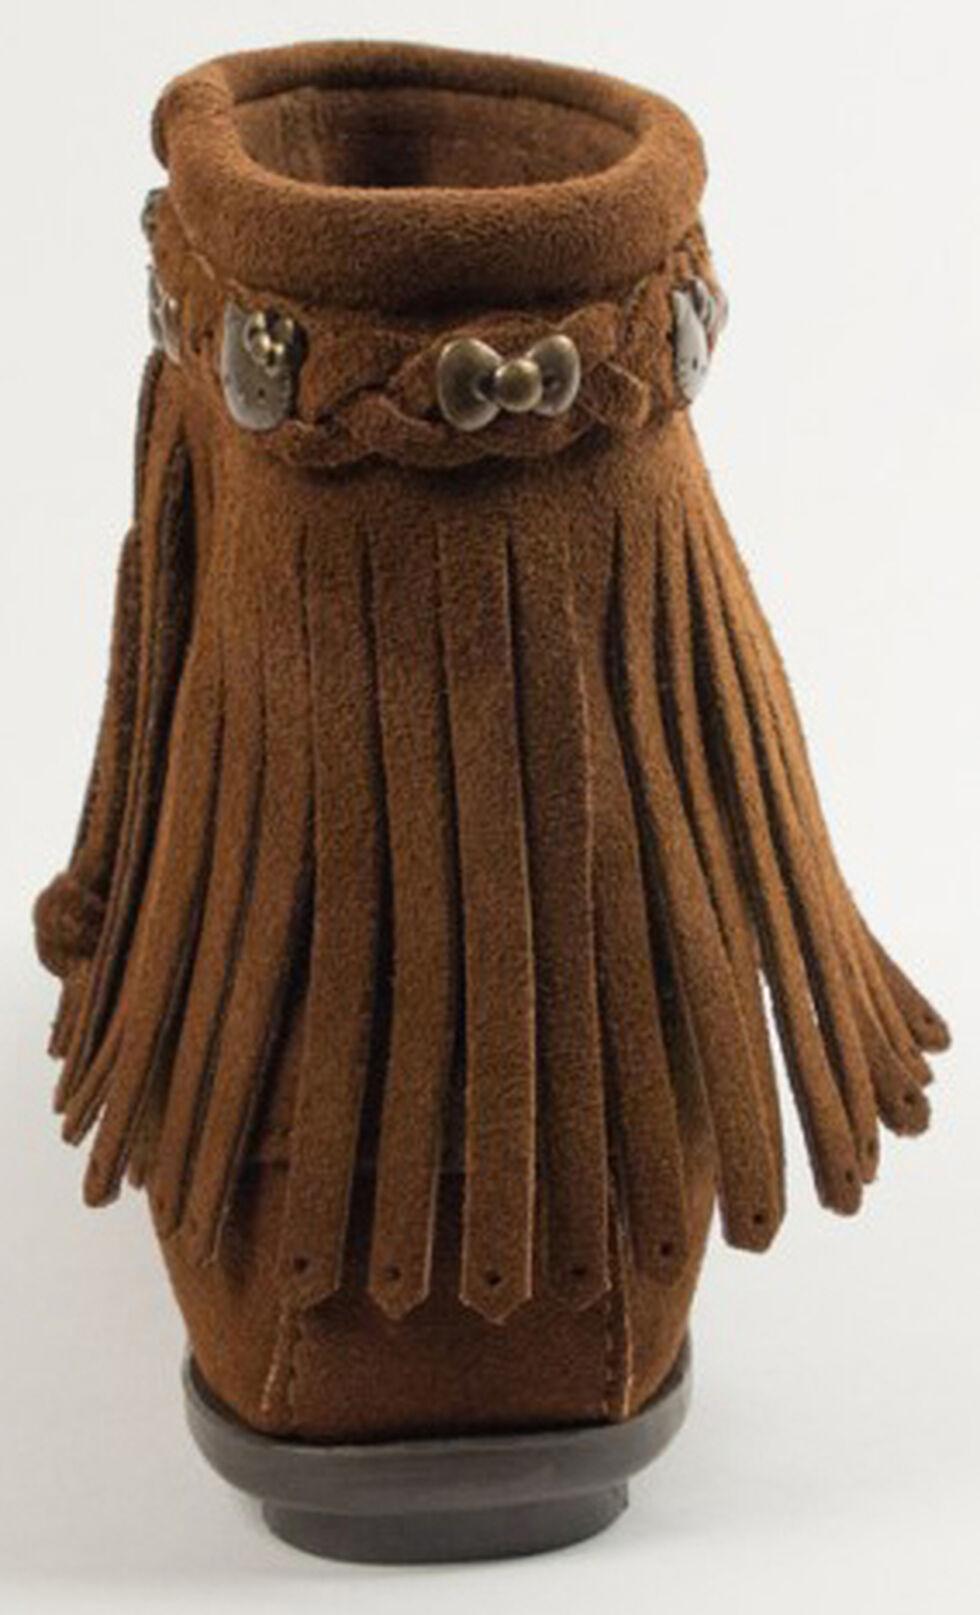 Minnetonka Women's Hello Kitty 40th Anniversary Fringe Boots, Dusty Brn, hi-res